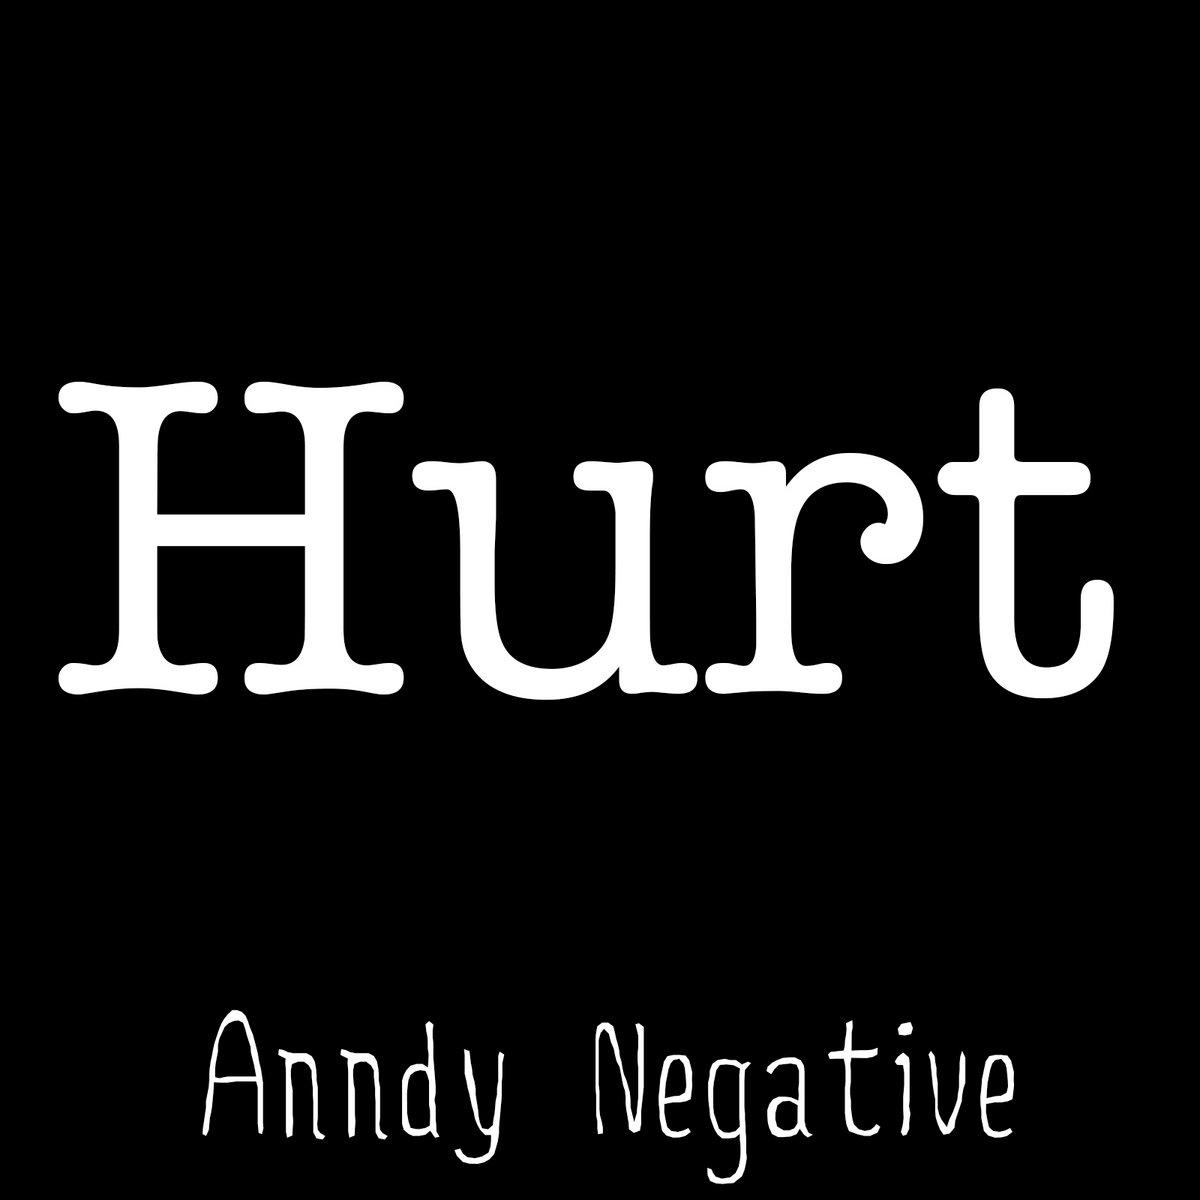 Hurt (Nine Inch Nails/Johnny Cash) | Anndy Negative